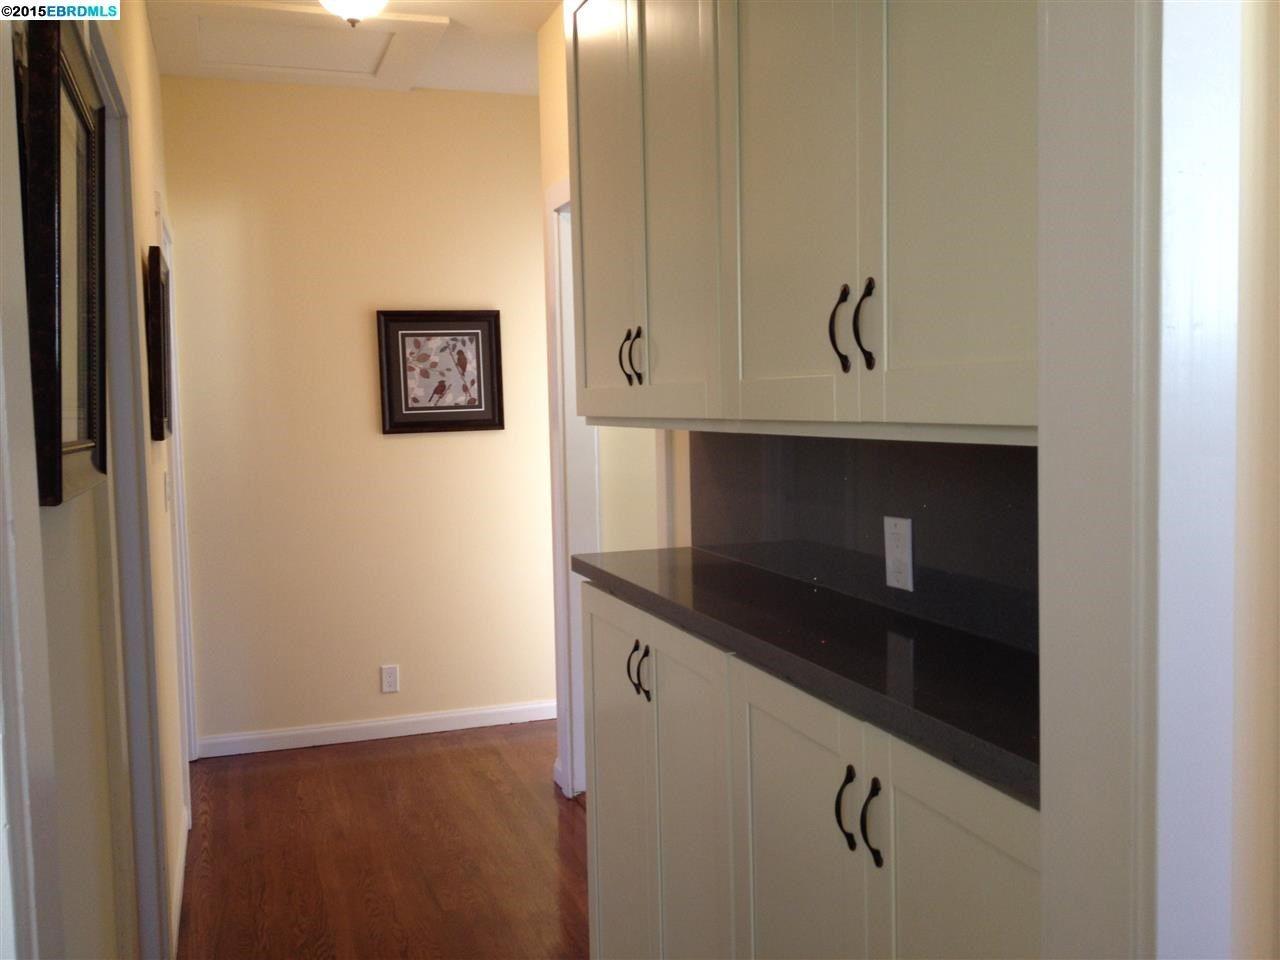 4618 Walnut St Oakland Ca 94619 Home Remodeling Home Renovation Upper Cabinets